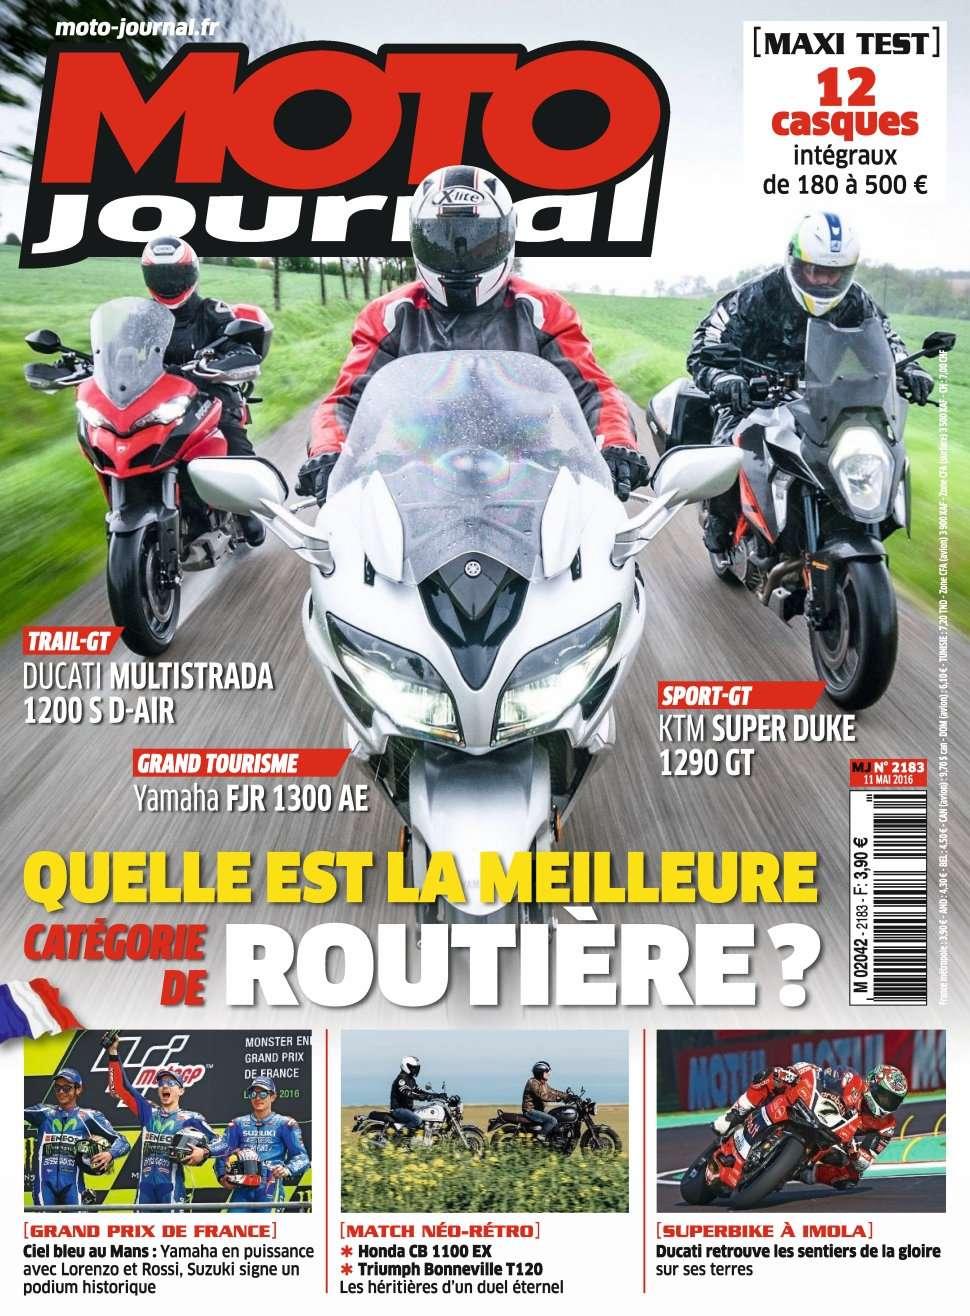 Moto Journal 2183 - 11 Mai 2016